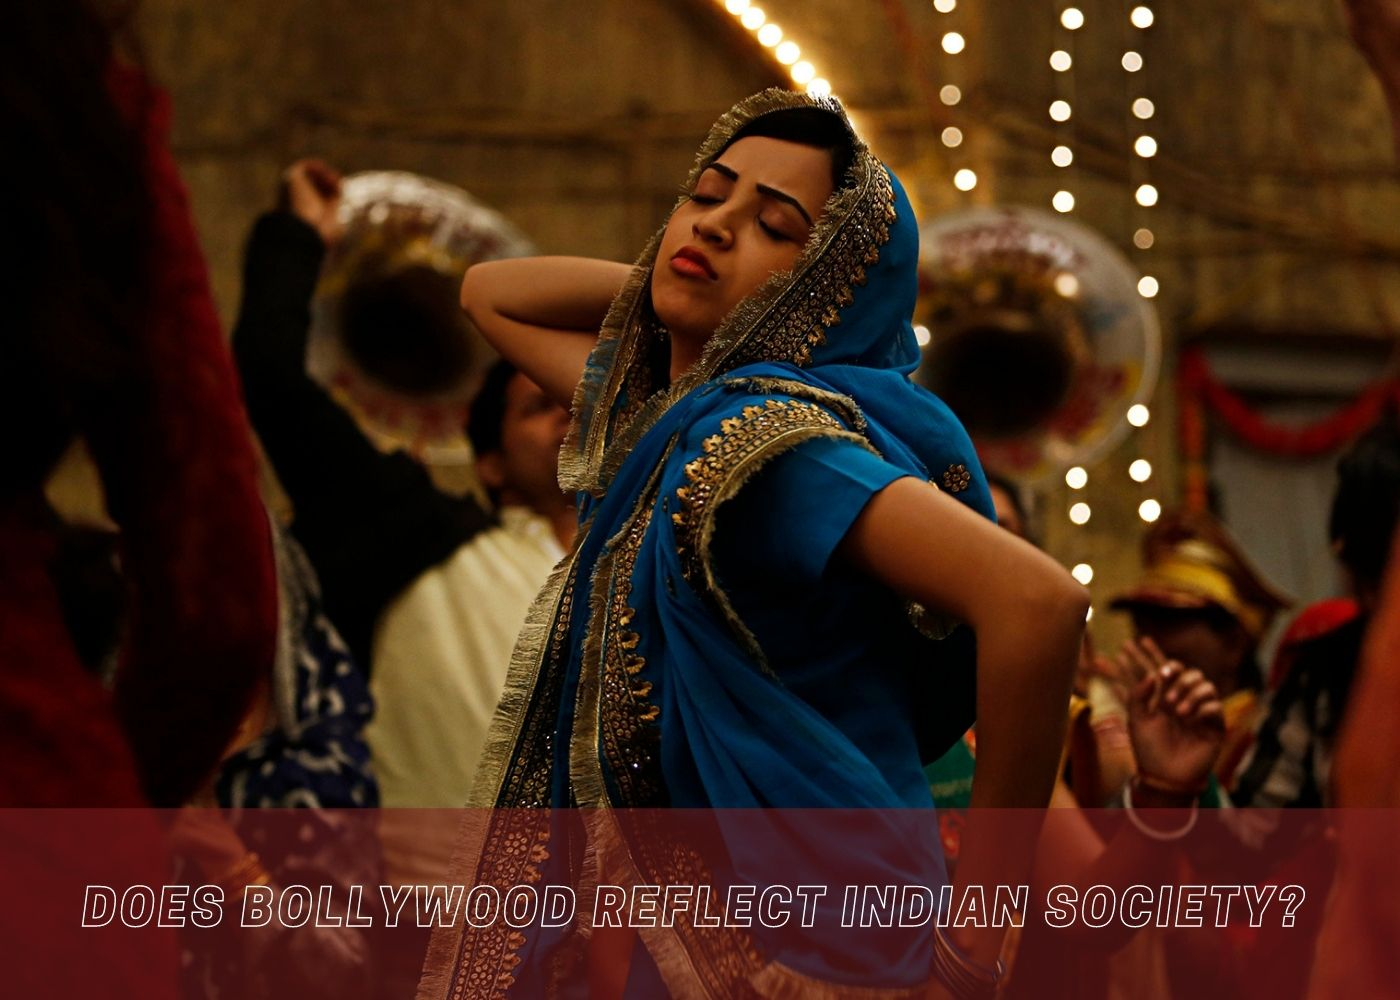 Does Bollywood Reflect Indian Society?